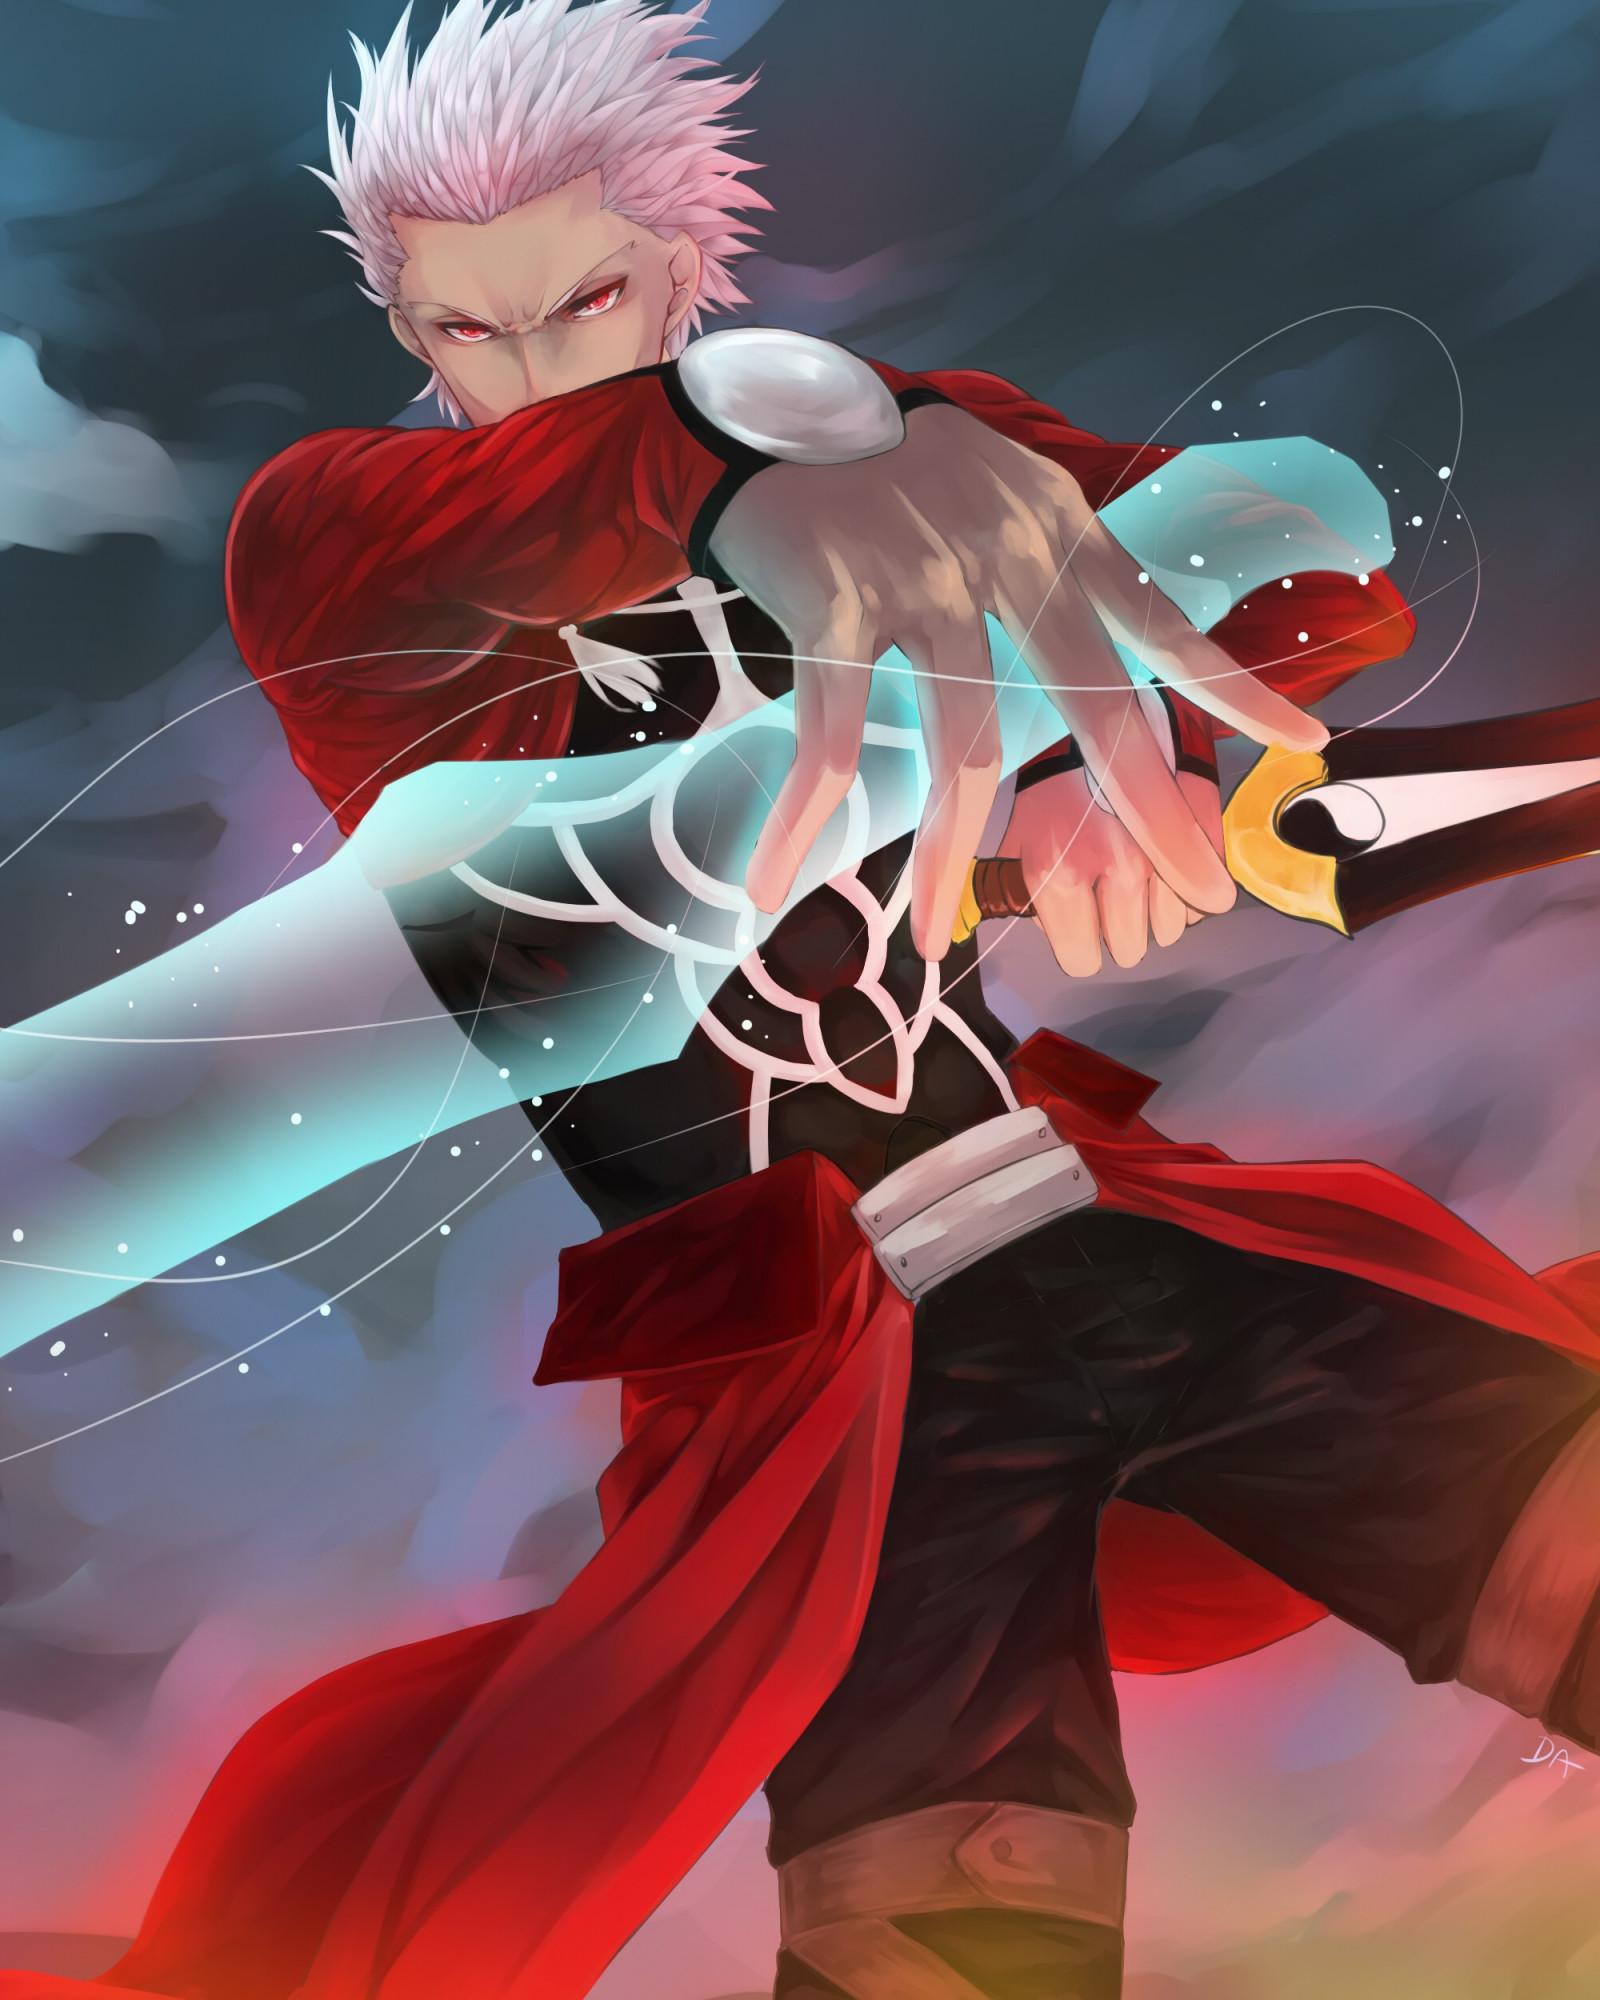 Wallpaper : digital art. Archer Fate Stay Night. Fate Stay Night. men. sword. red dress 2000x2500 - elcomandante81 - 1141180 - HD Wallpapers ...